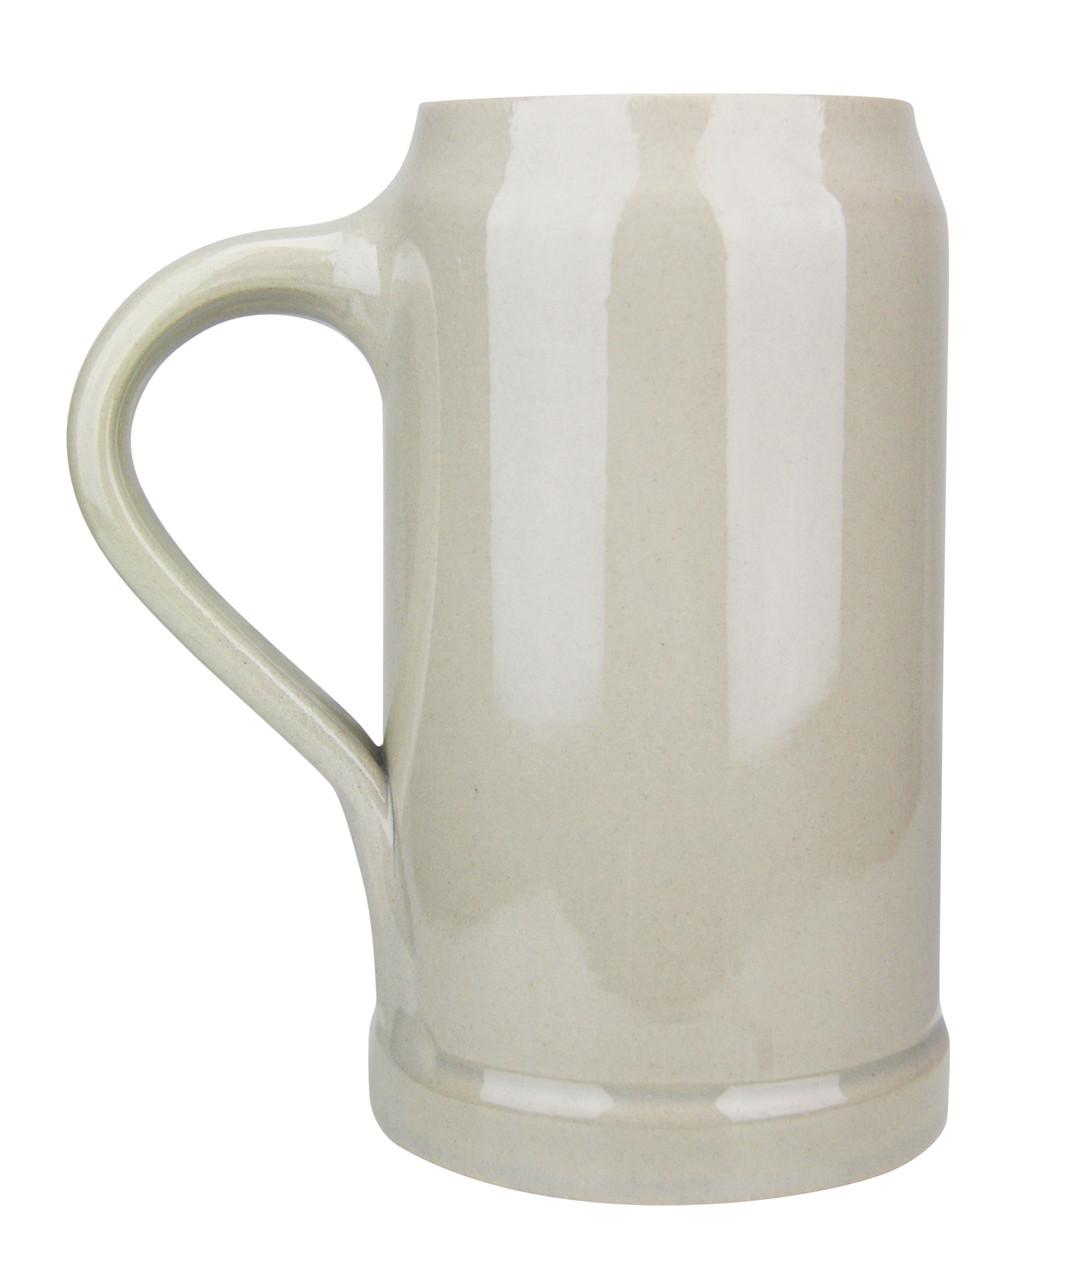 German Stoneware Beer Mug 1 Liter Germansteins Com